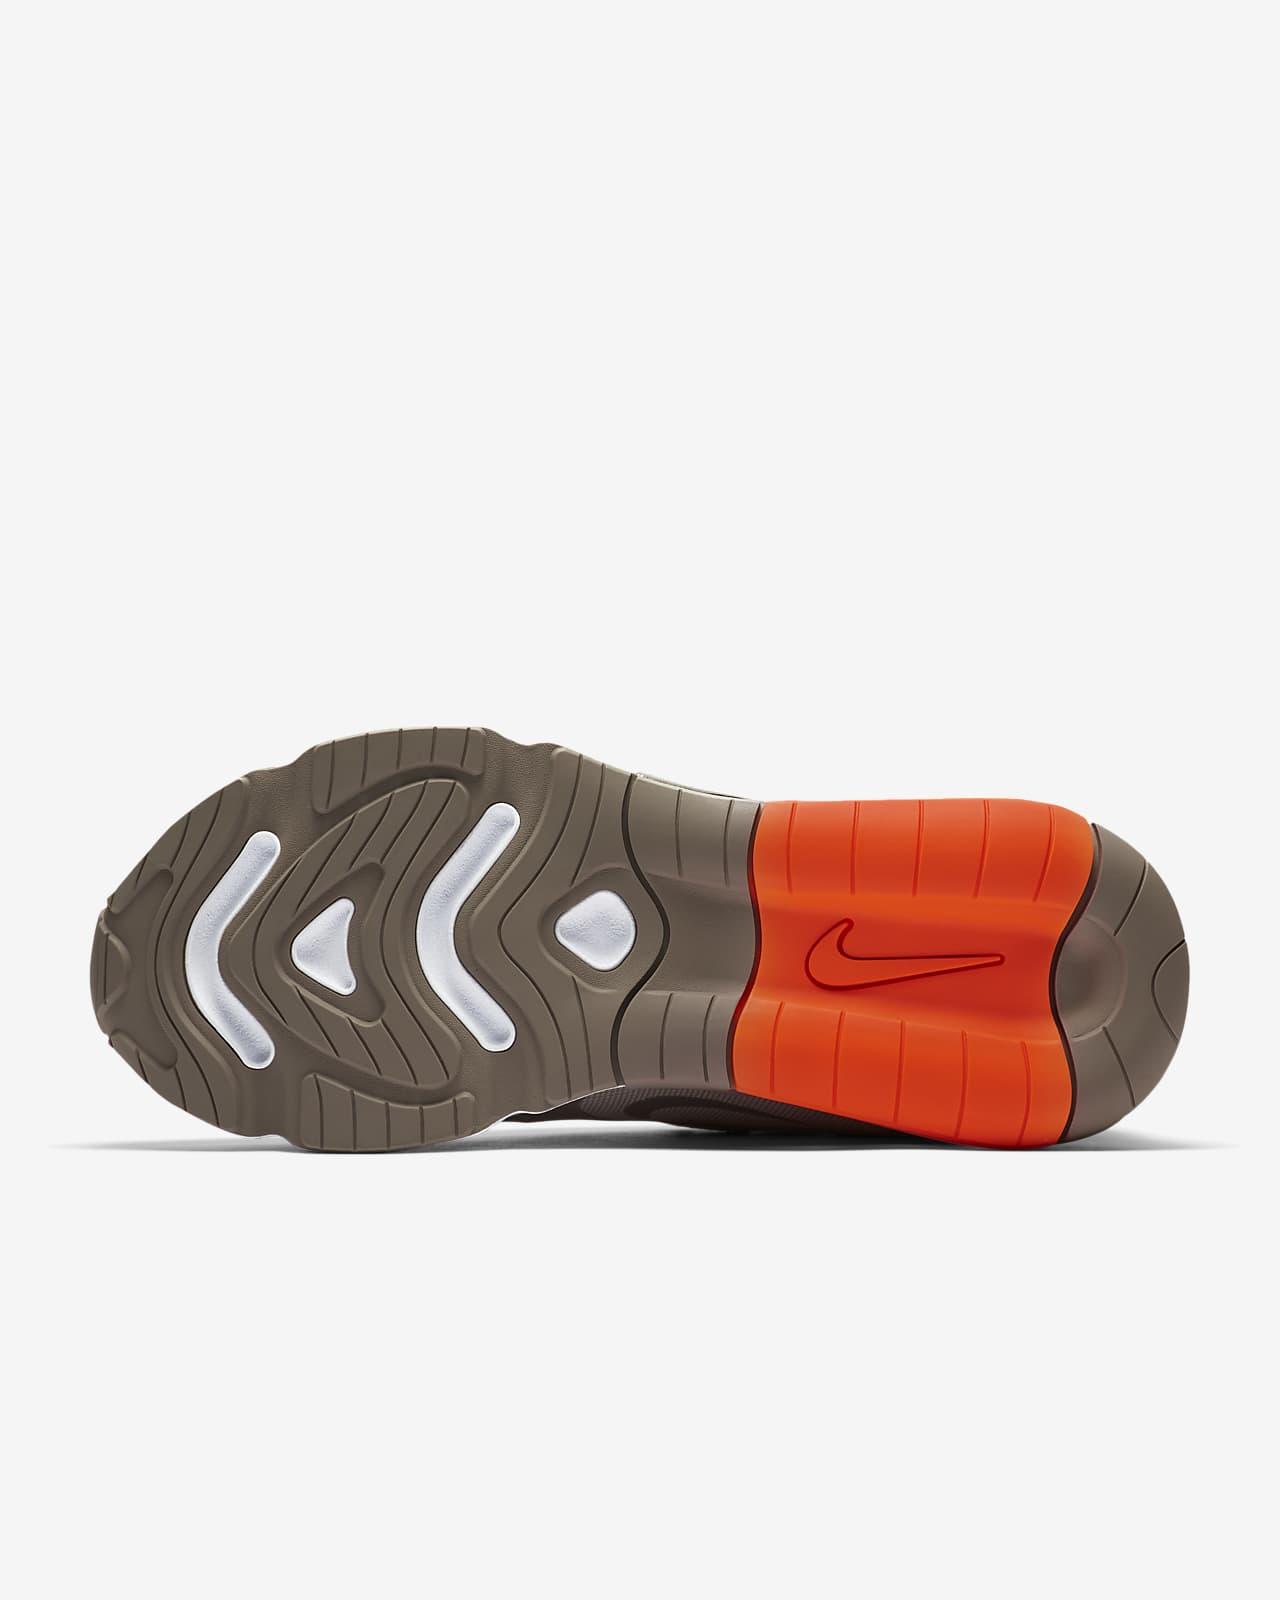 accidente Ambiguo Escarpa  Nike Air Max 200 Winter Men's Shoe. Nike.com